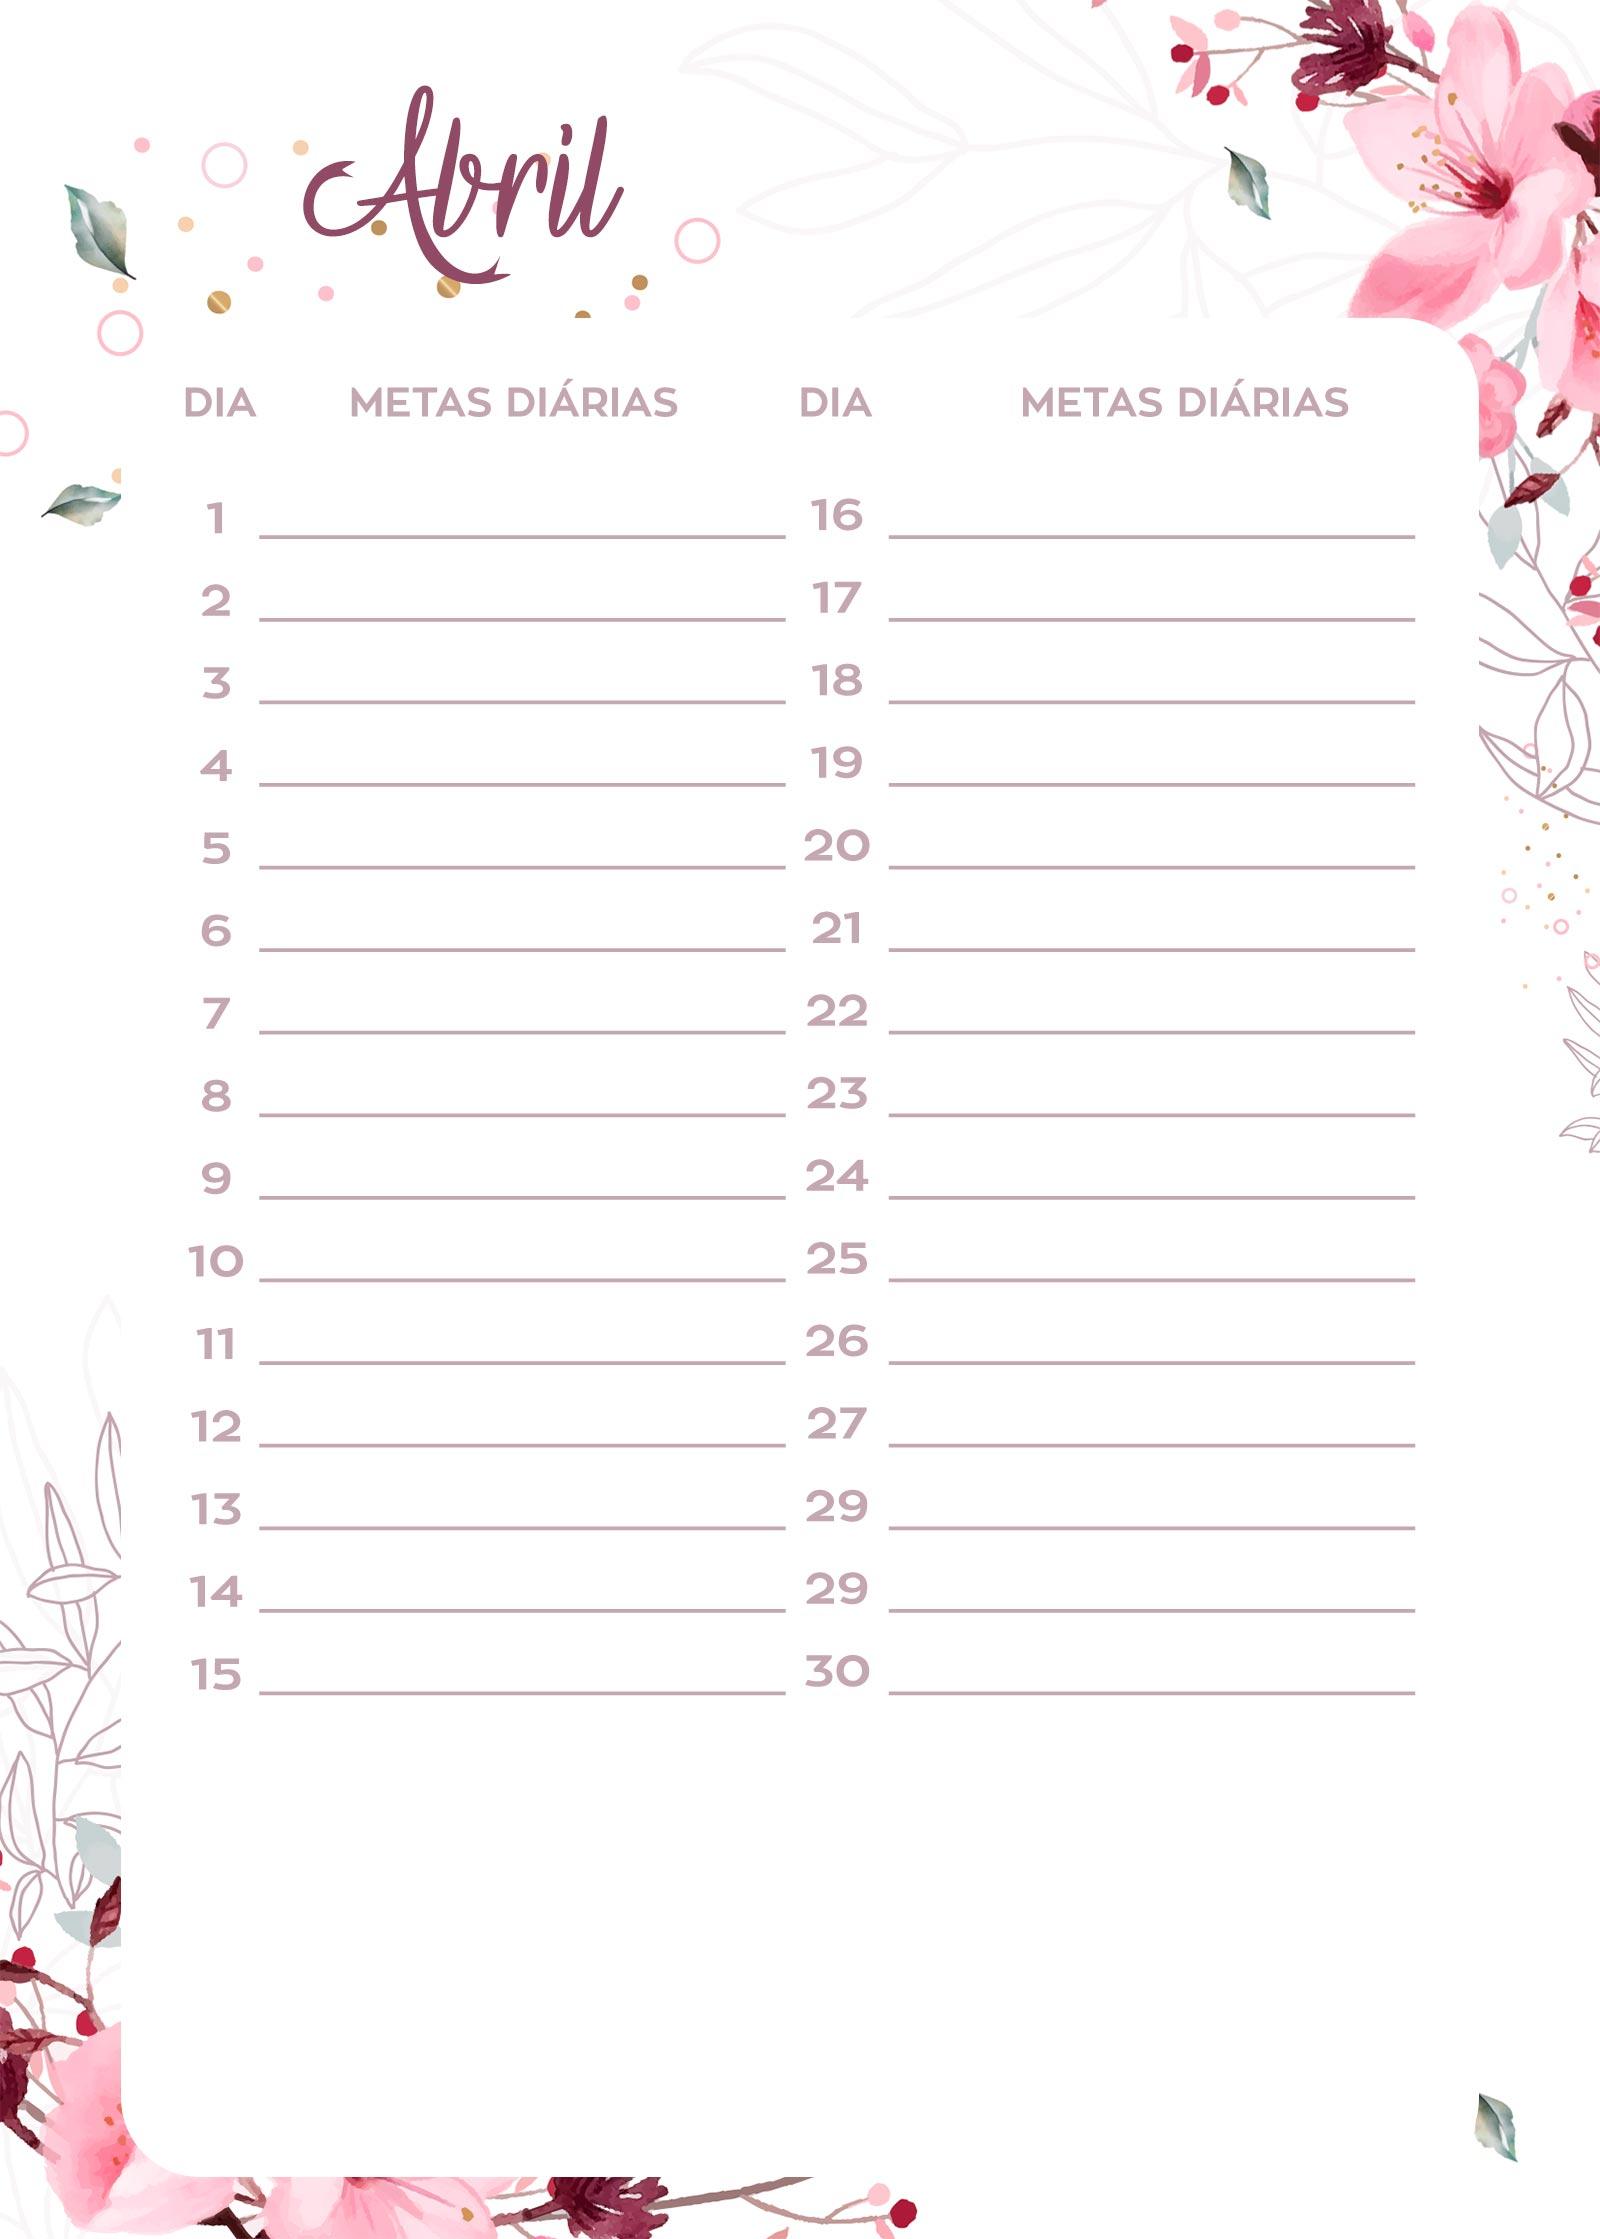 Planner Floral metas diarias abril